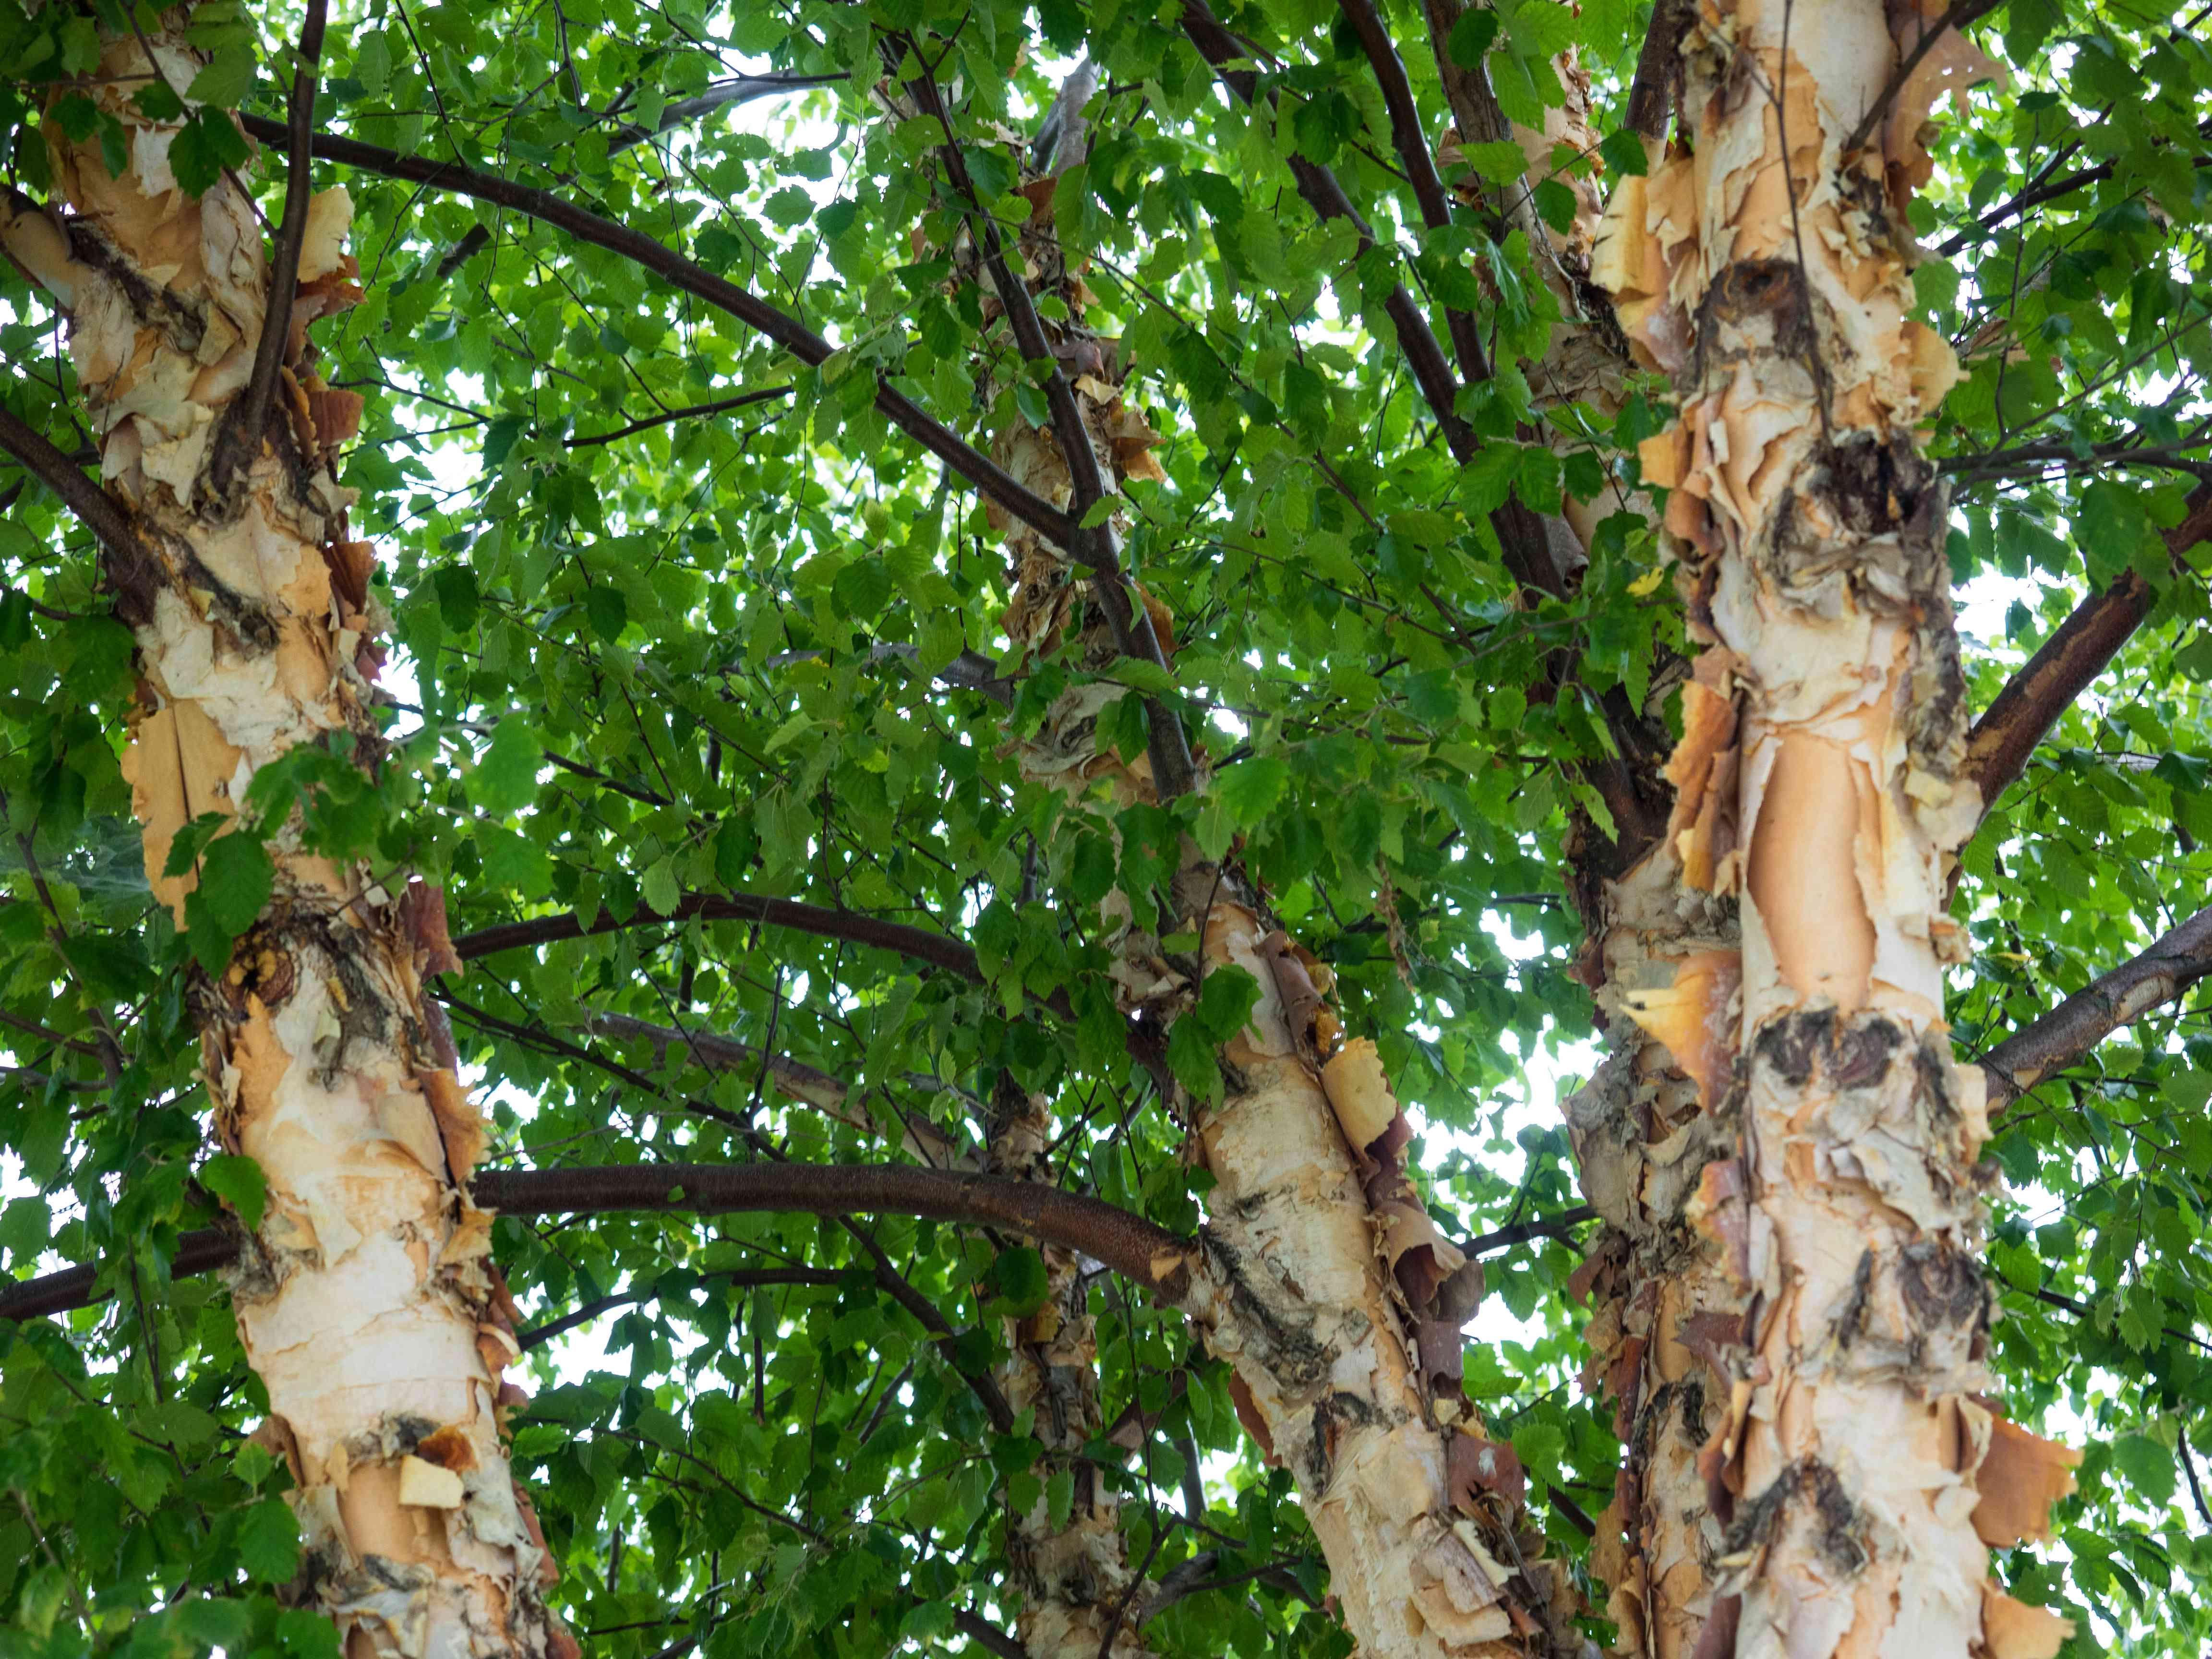 The river birch has interesting peeling bark.